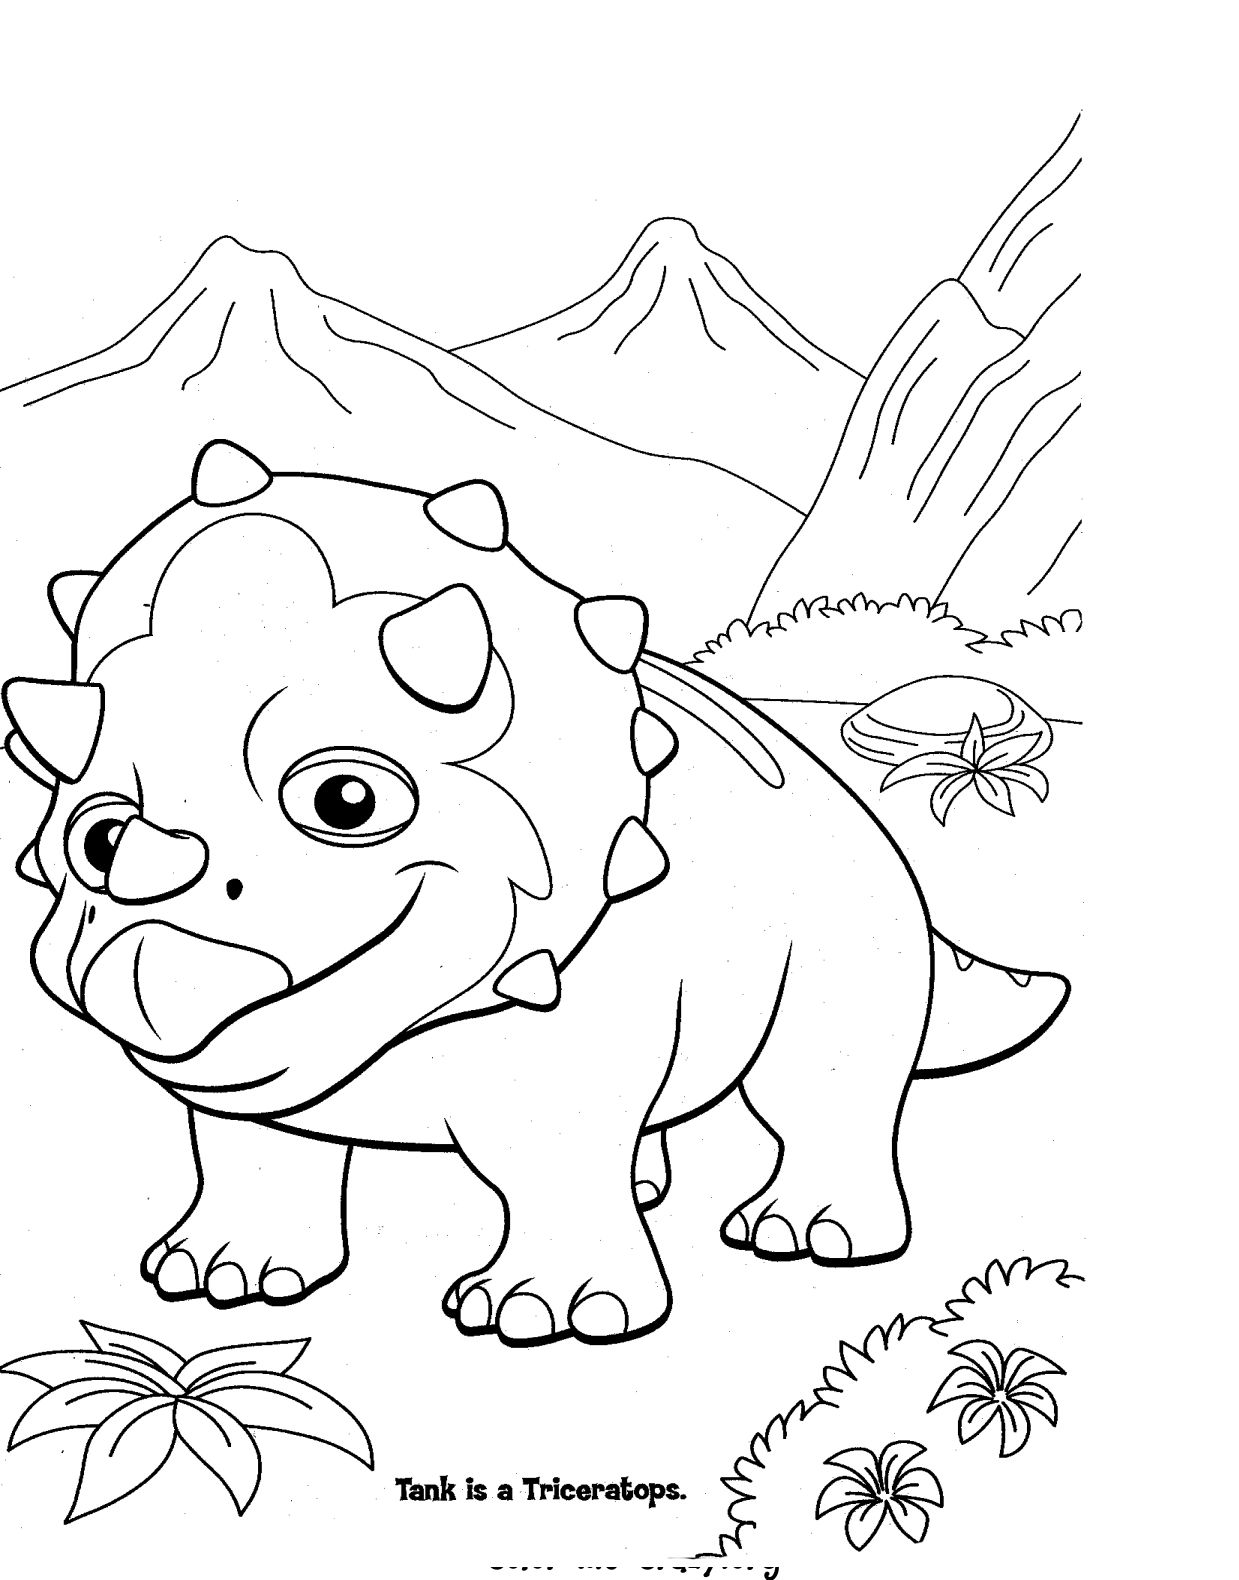 ColorMeCrazy.org: Dinosaur Train Coloring Pages